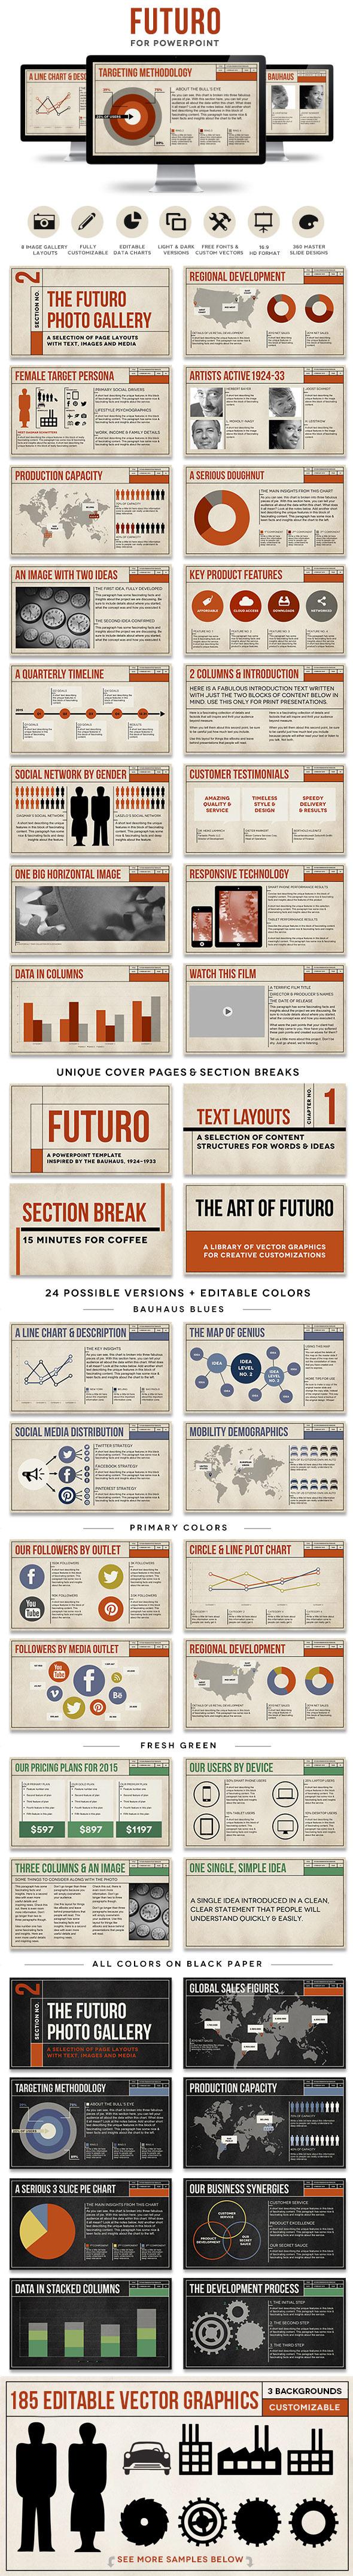 Futuro Powerpoint Presentation Template - Creative PowerPoint Templates